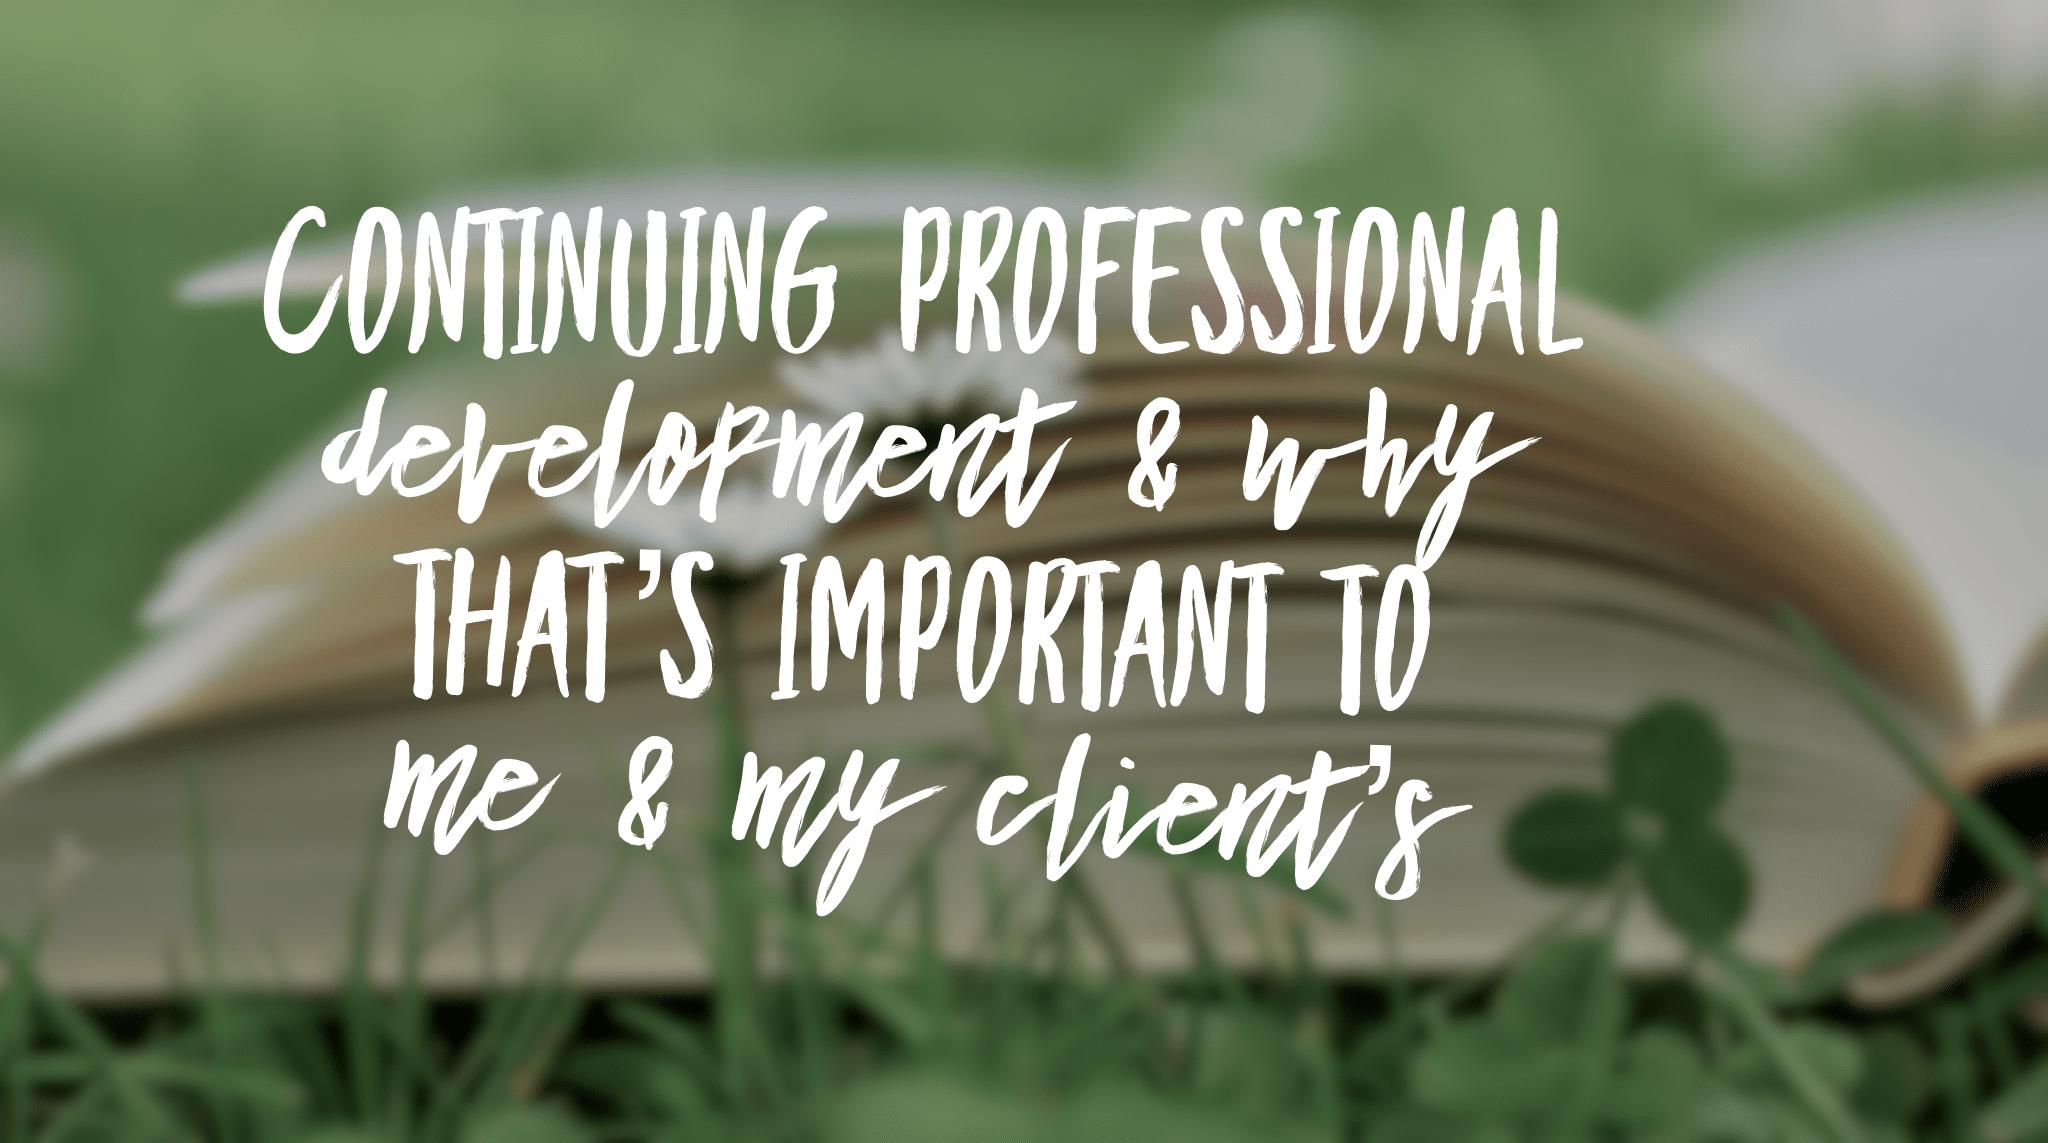 Continuing professional development blog title header